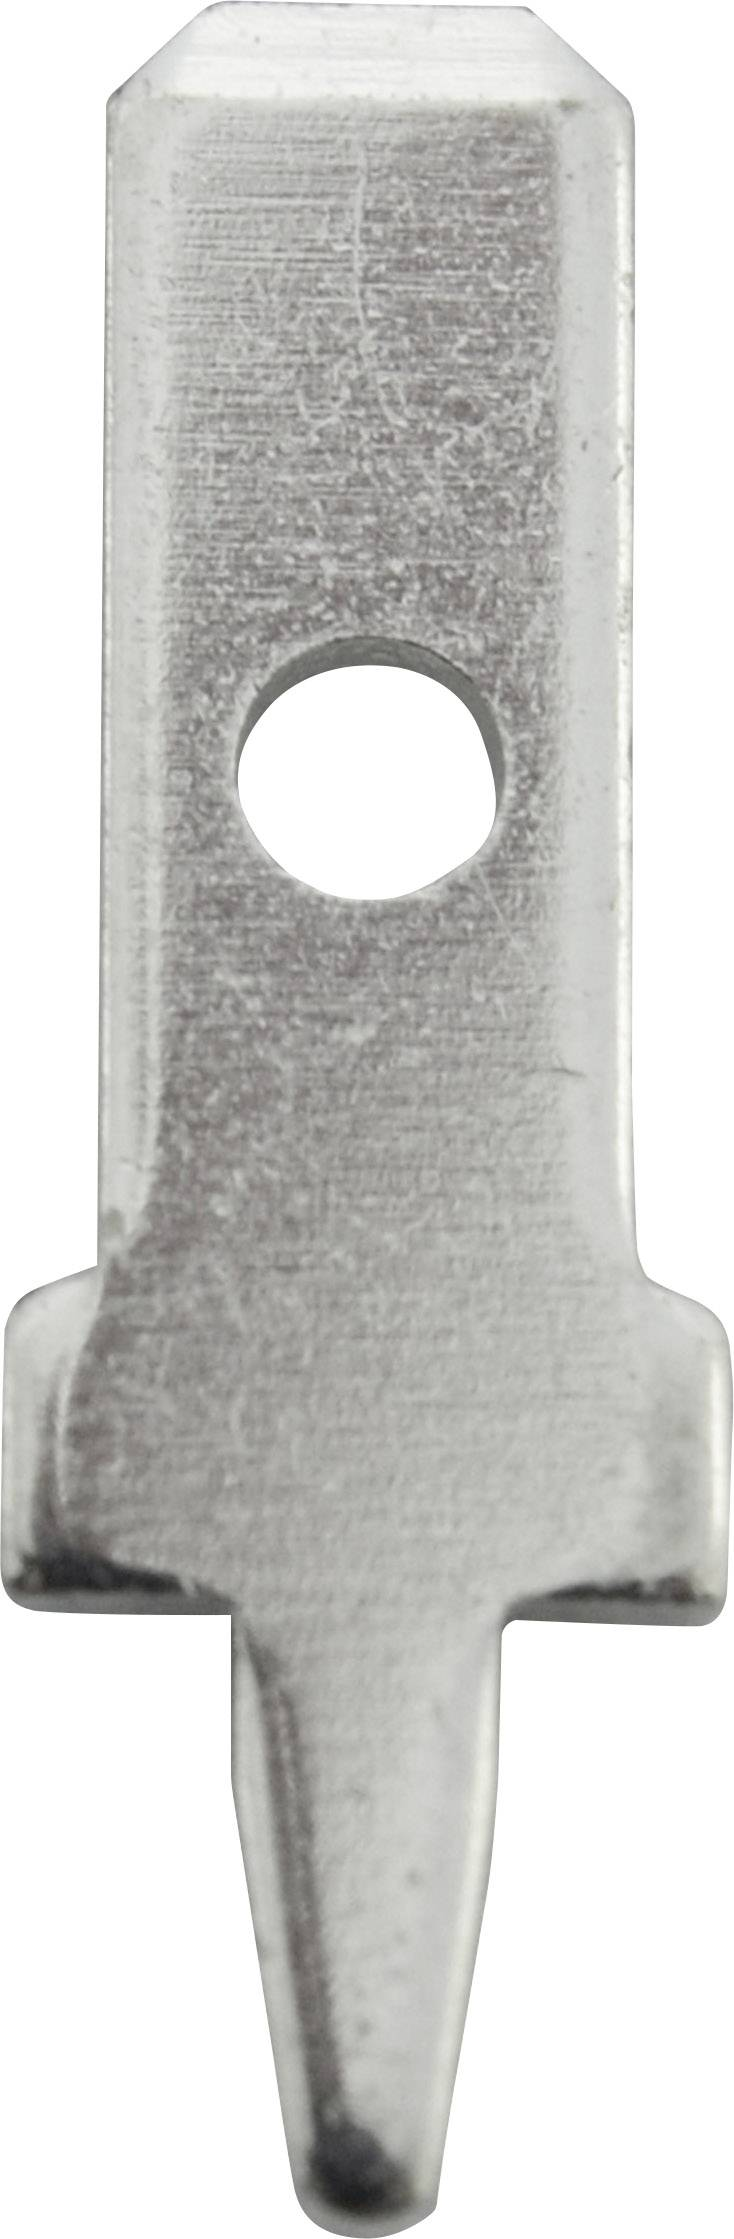 Faston zástrčka Vogt Verbindungstechnik 3775a05.68 2.8 mm x 0.5 mm, 180 °, bez izolace, kov, 100 ks